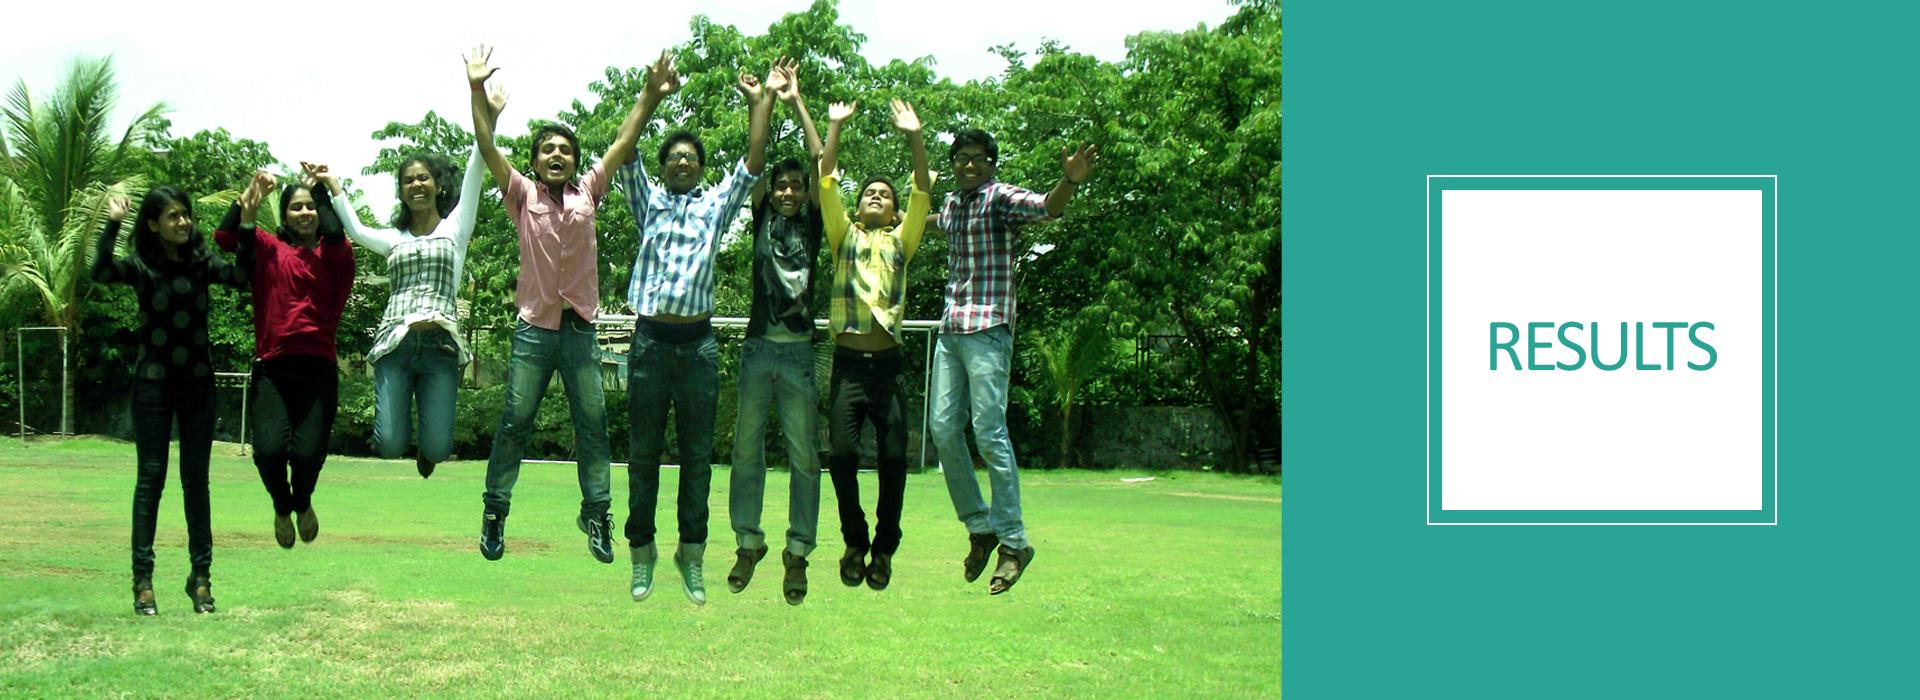 CBSE Board Schools in Kalyan, Ambernath, Dombivli - Arya Gurukul